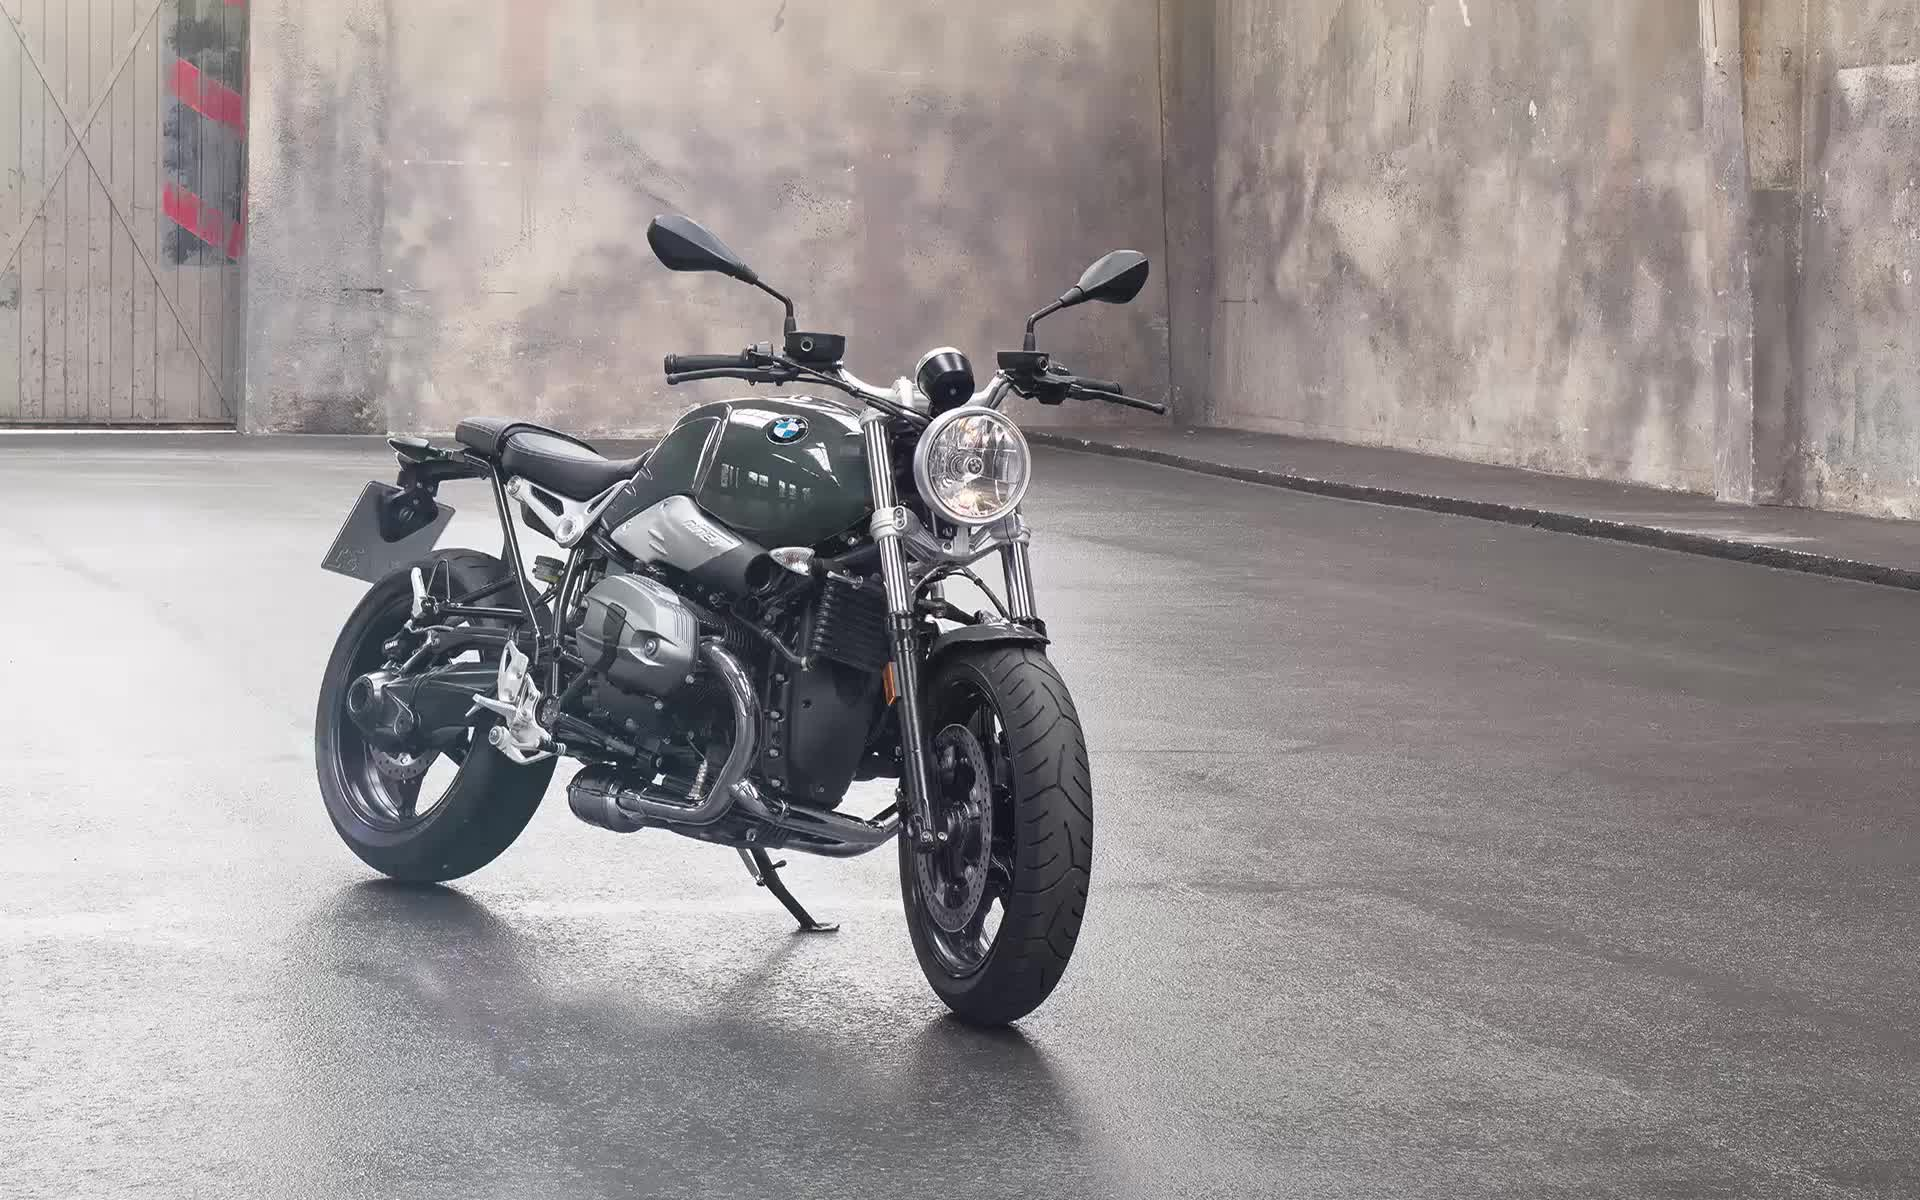 BMW Rhine T-Pure мотоцикл - живые обои